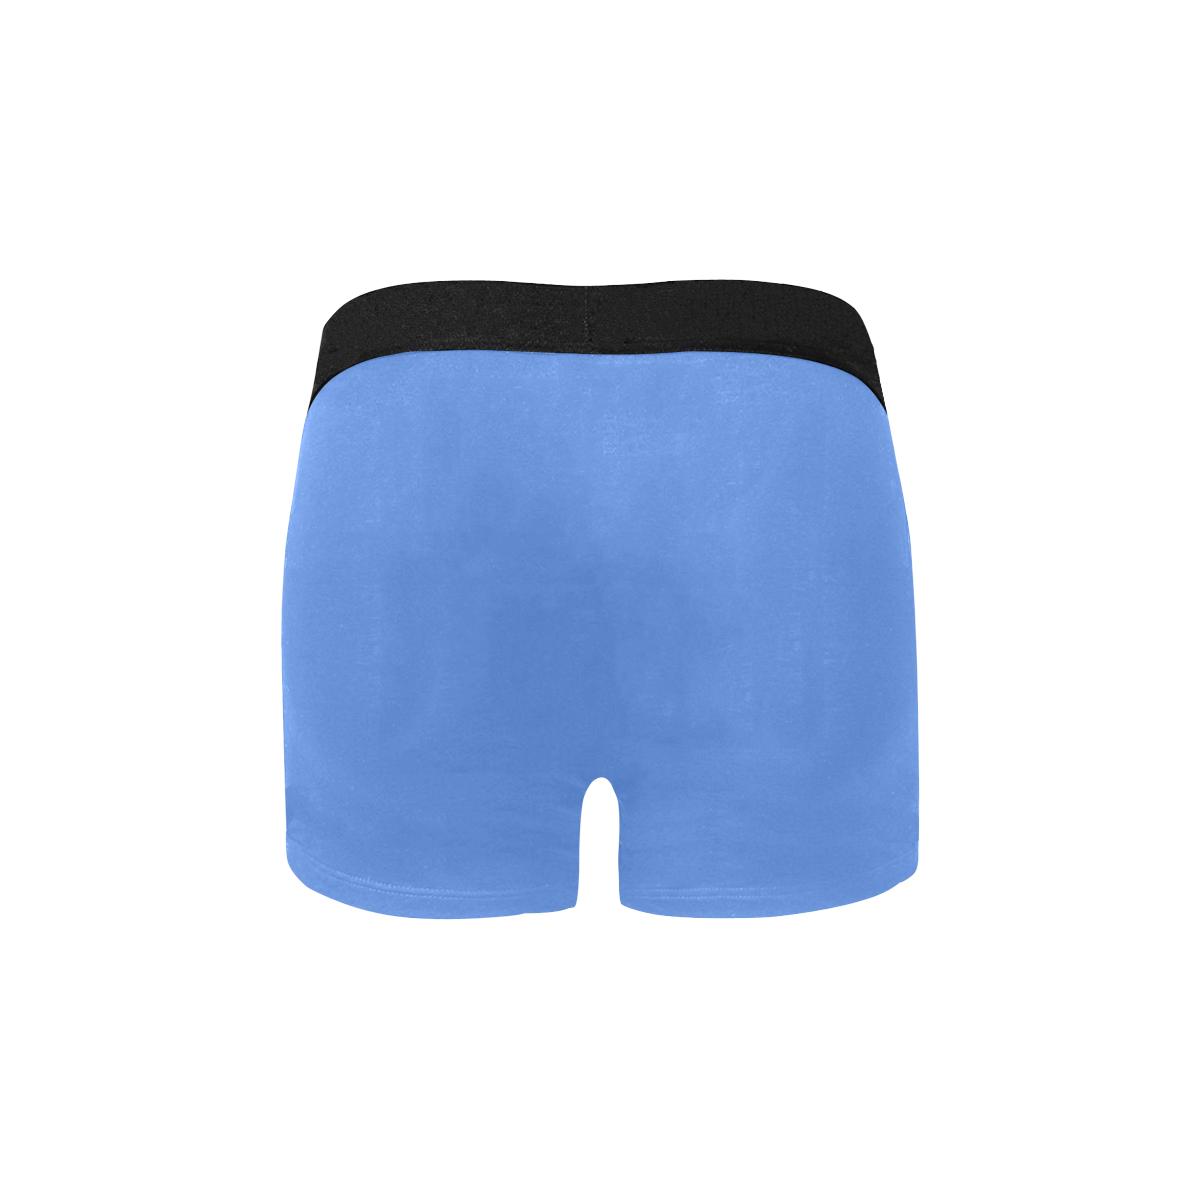 color cornflower blue Men's All Over Print Boxer Briefs (Model L34)